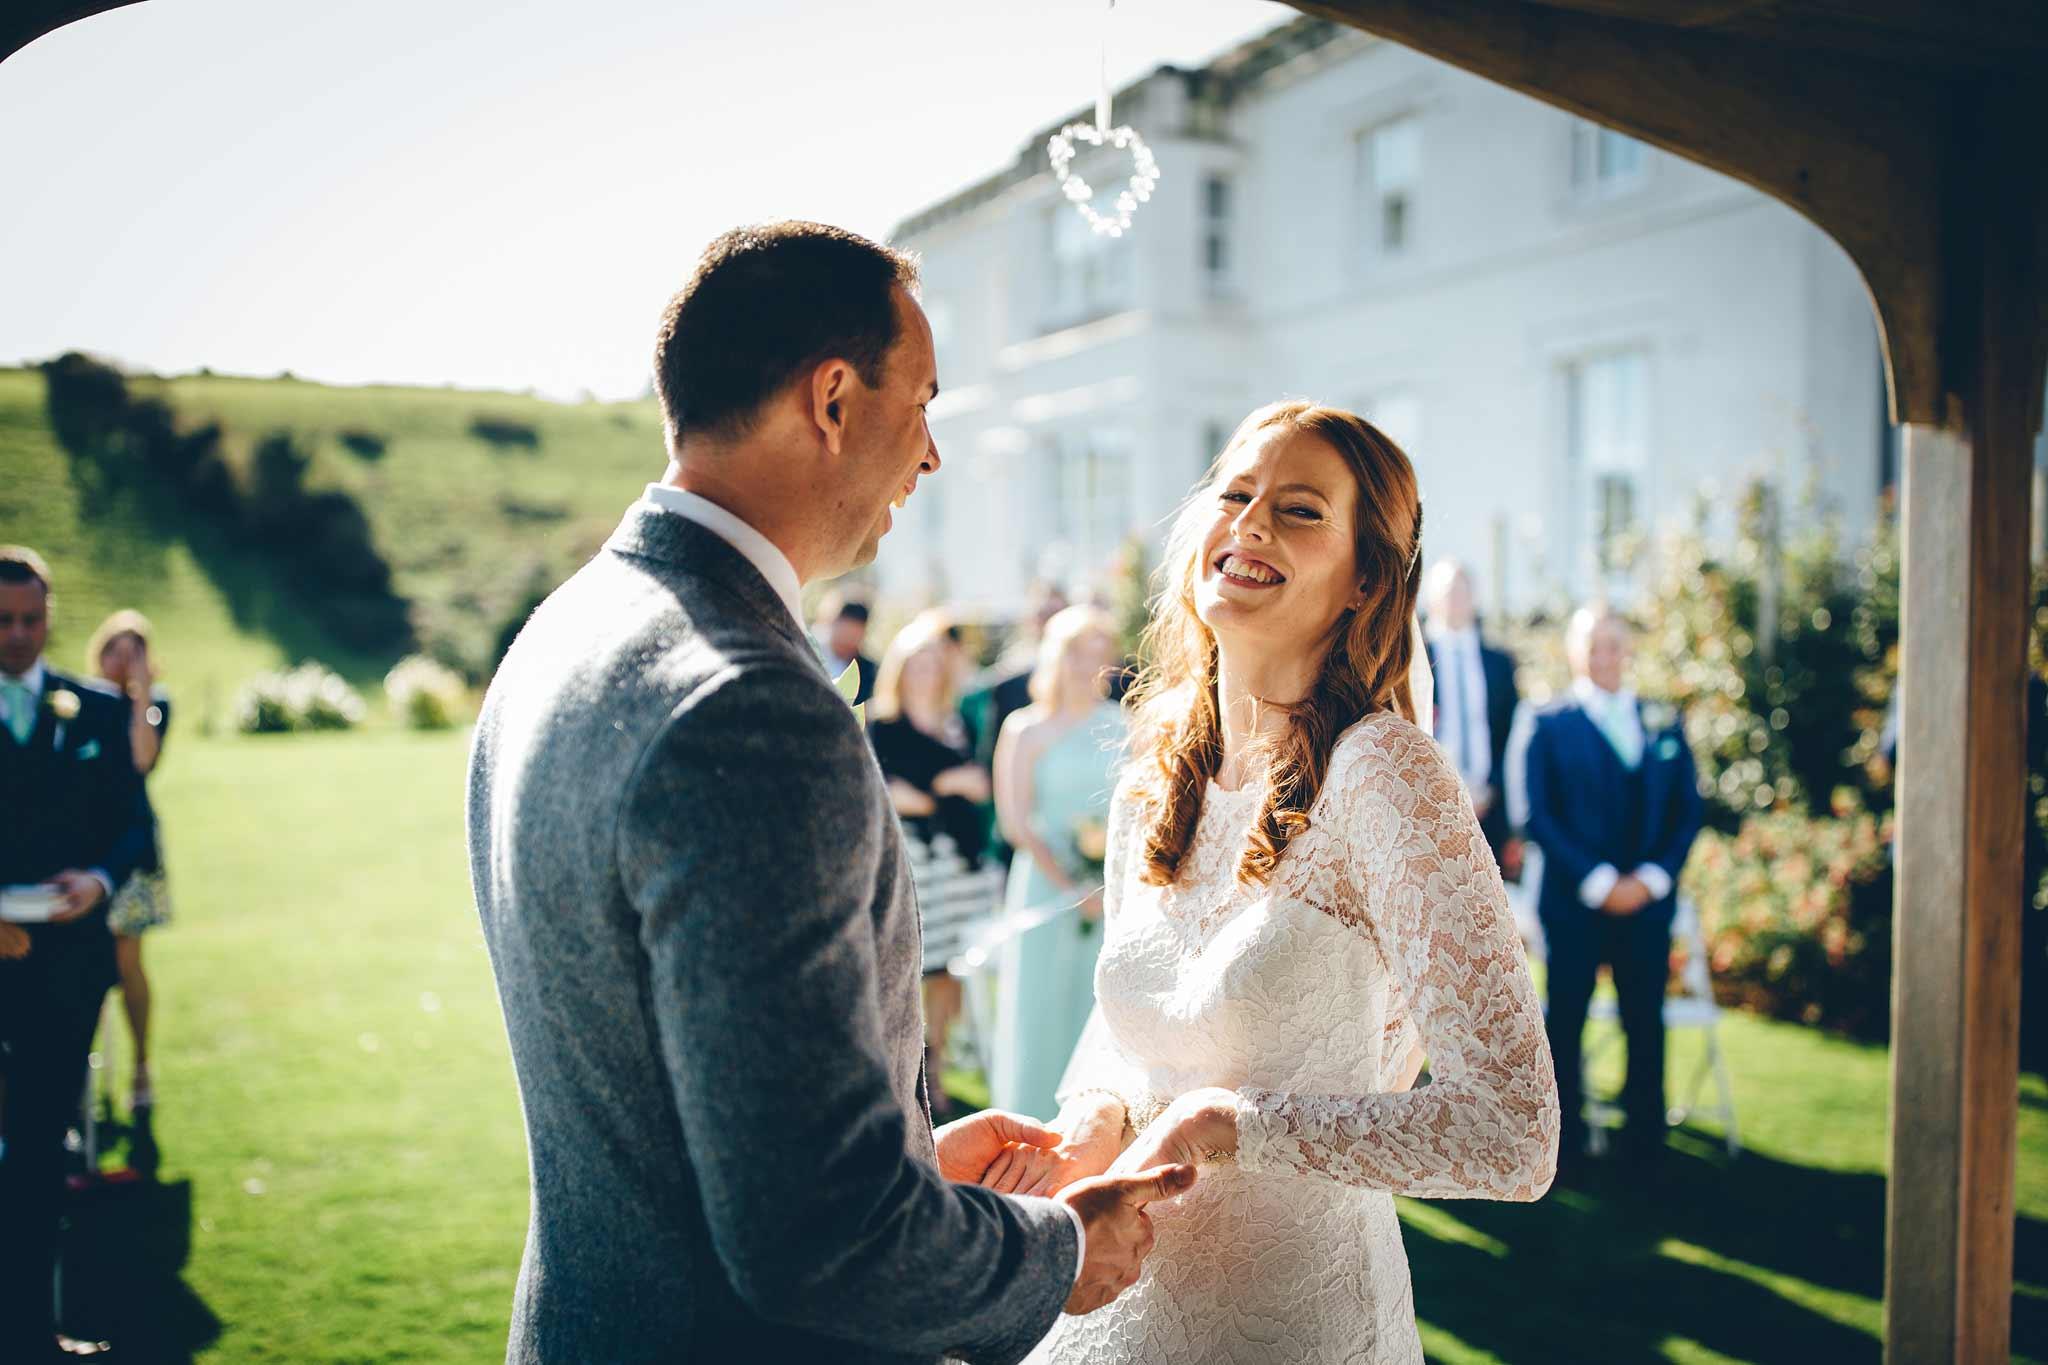 Polpier and Penpol Wedding Photographer 24